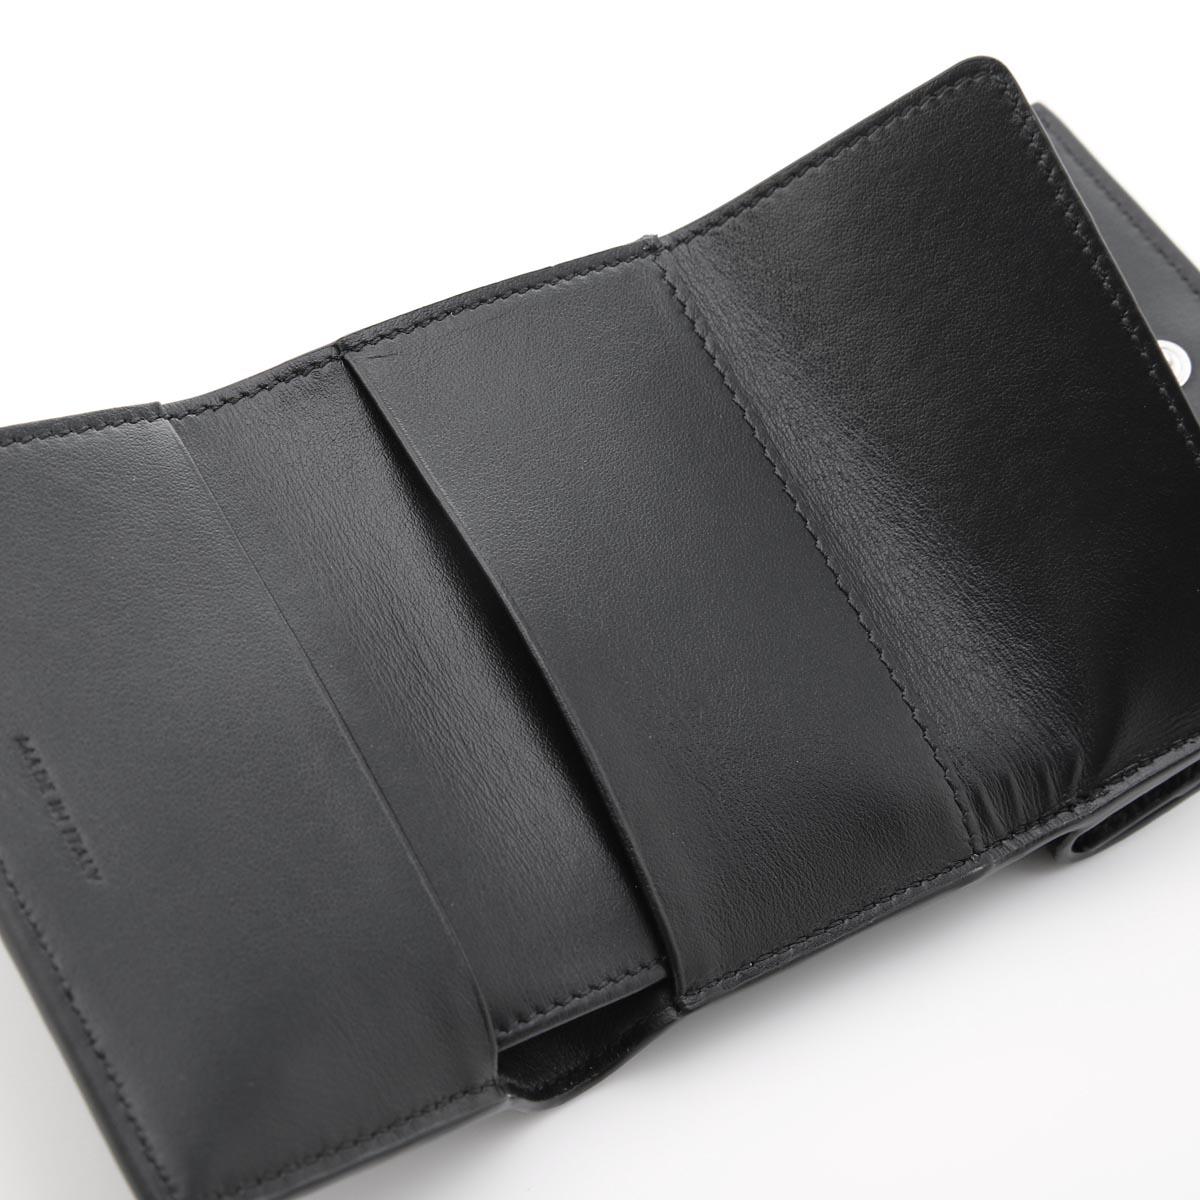 CELINE セリーヌ 3つ折り財布 小銭入れ付き メンズ